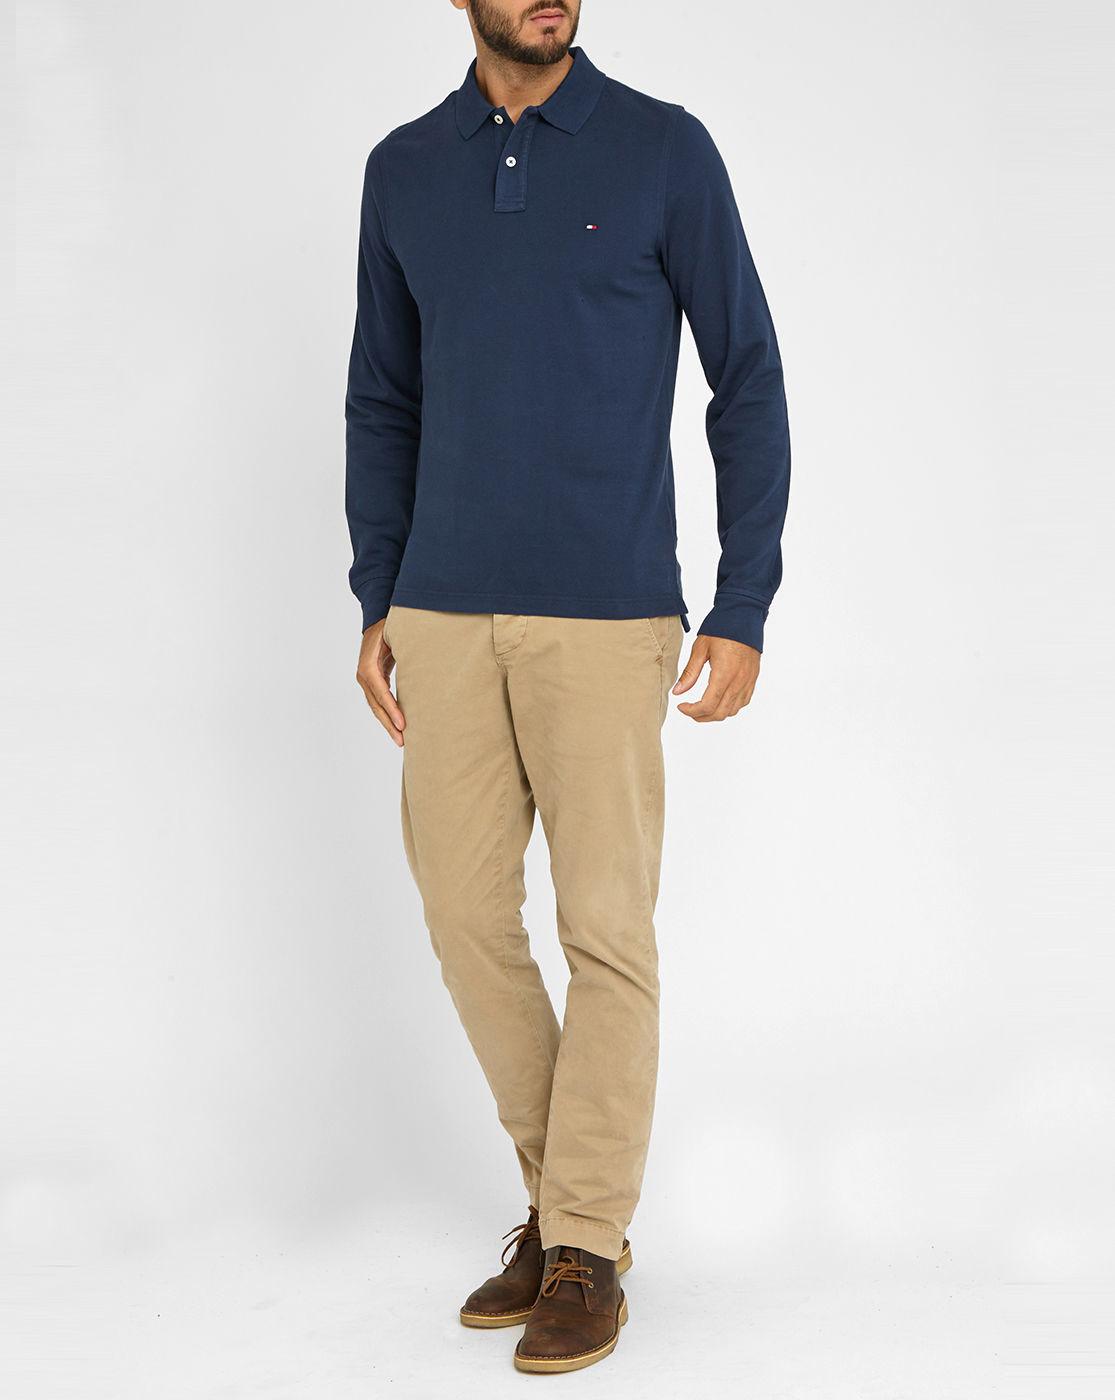 Tommy Hilfiger Navy Premium Piqu Long Sleeve Polo Shirt